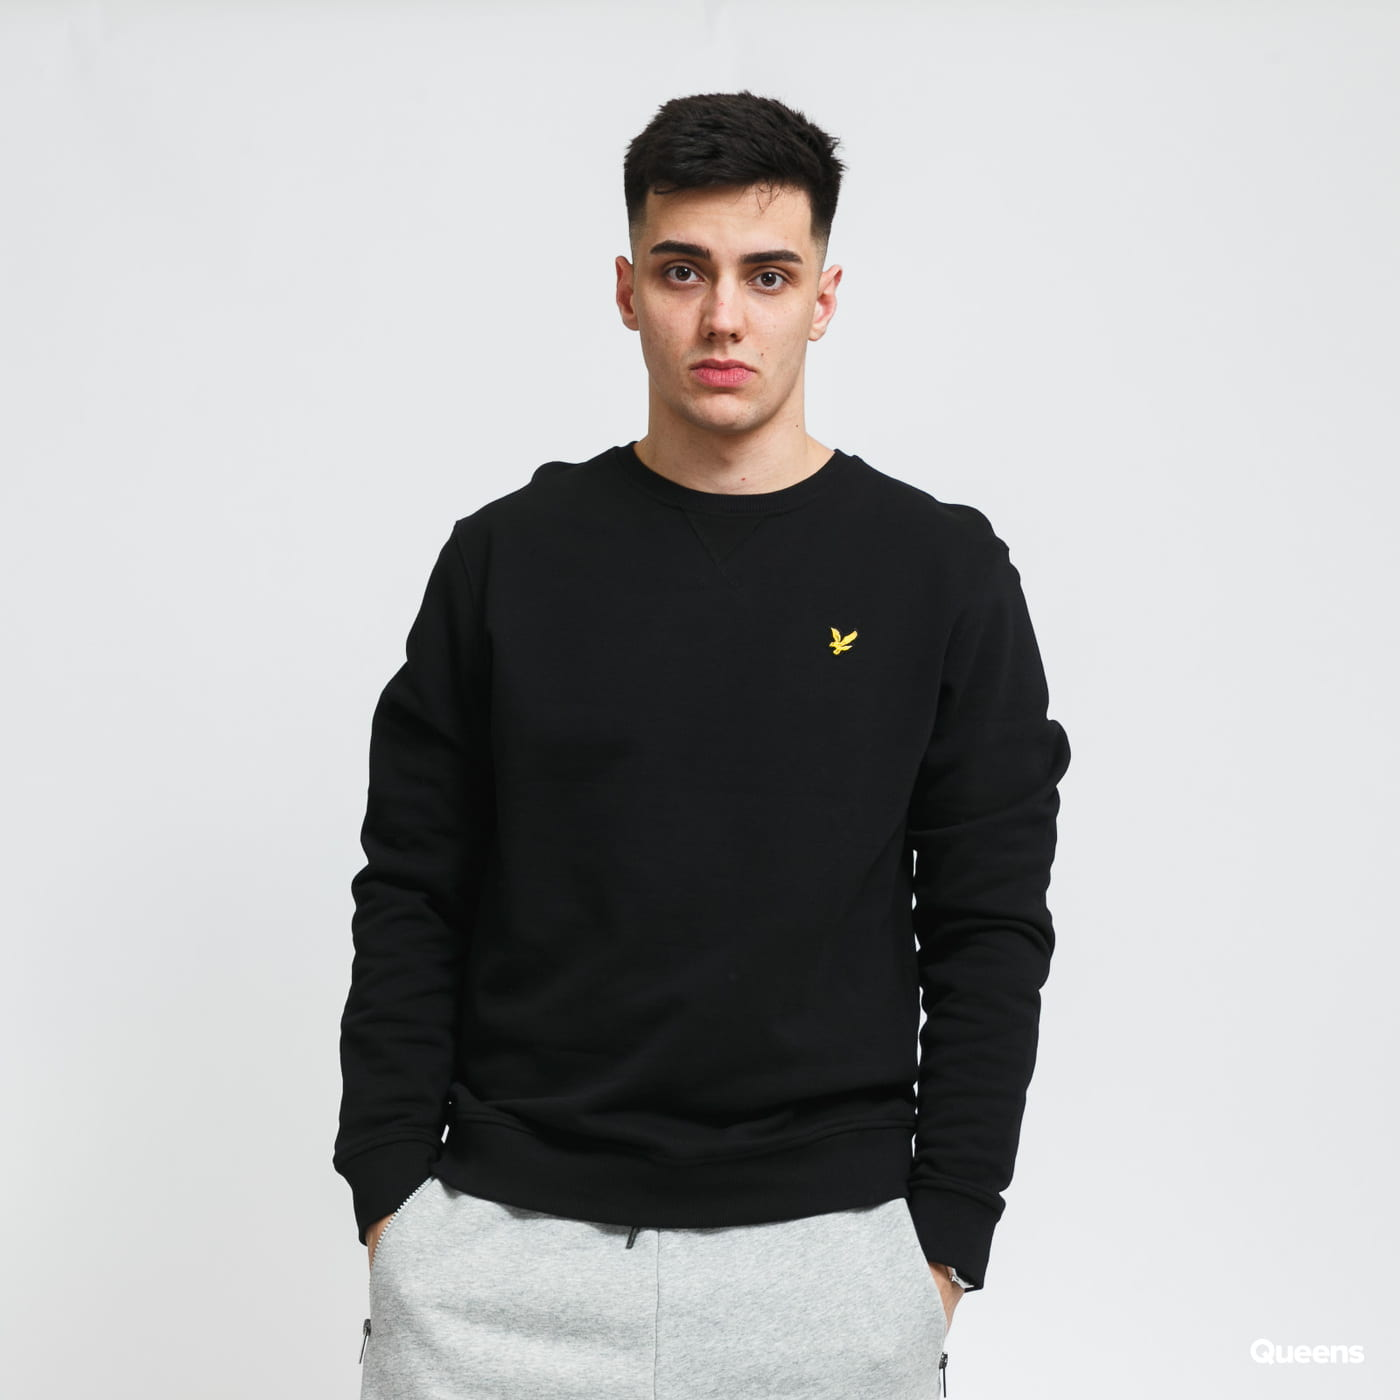 Lyle & Scott Crew Neck Sweatshirt gray / beige / pink / black